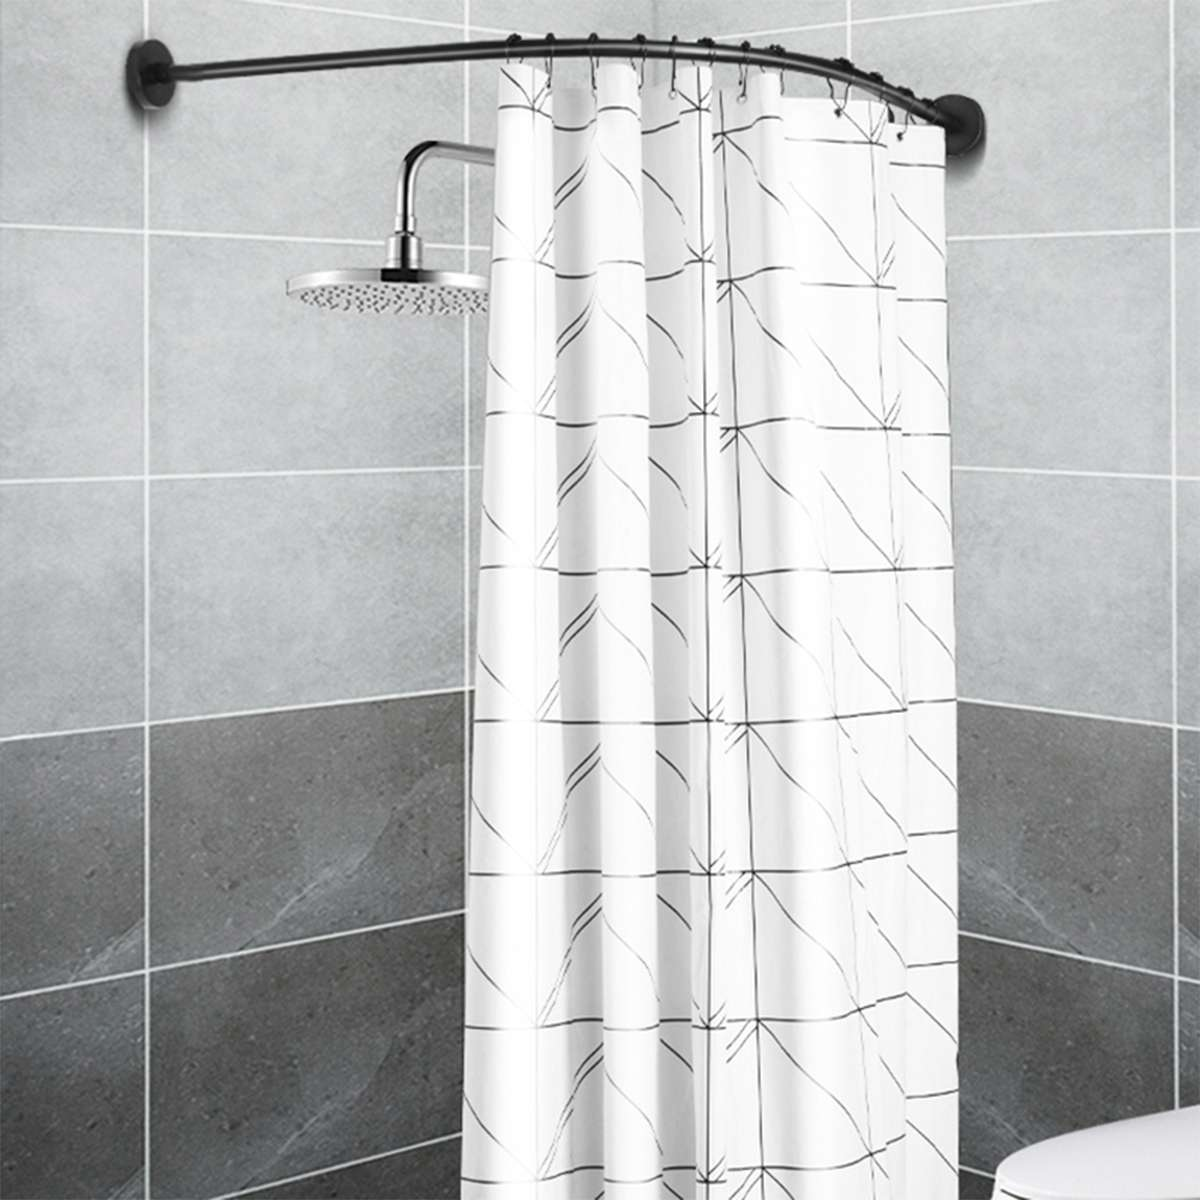 Extendable Corner Shower Curtain Rod Pole Black Stainless Steel